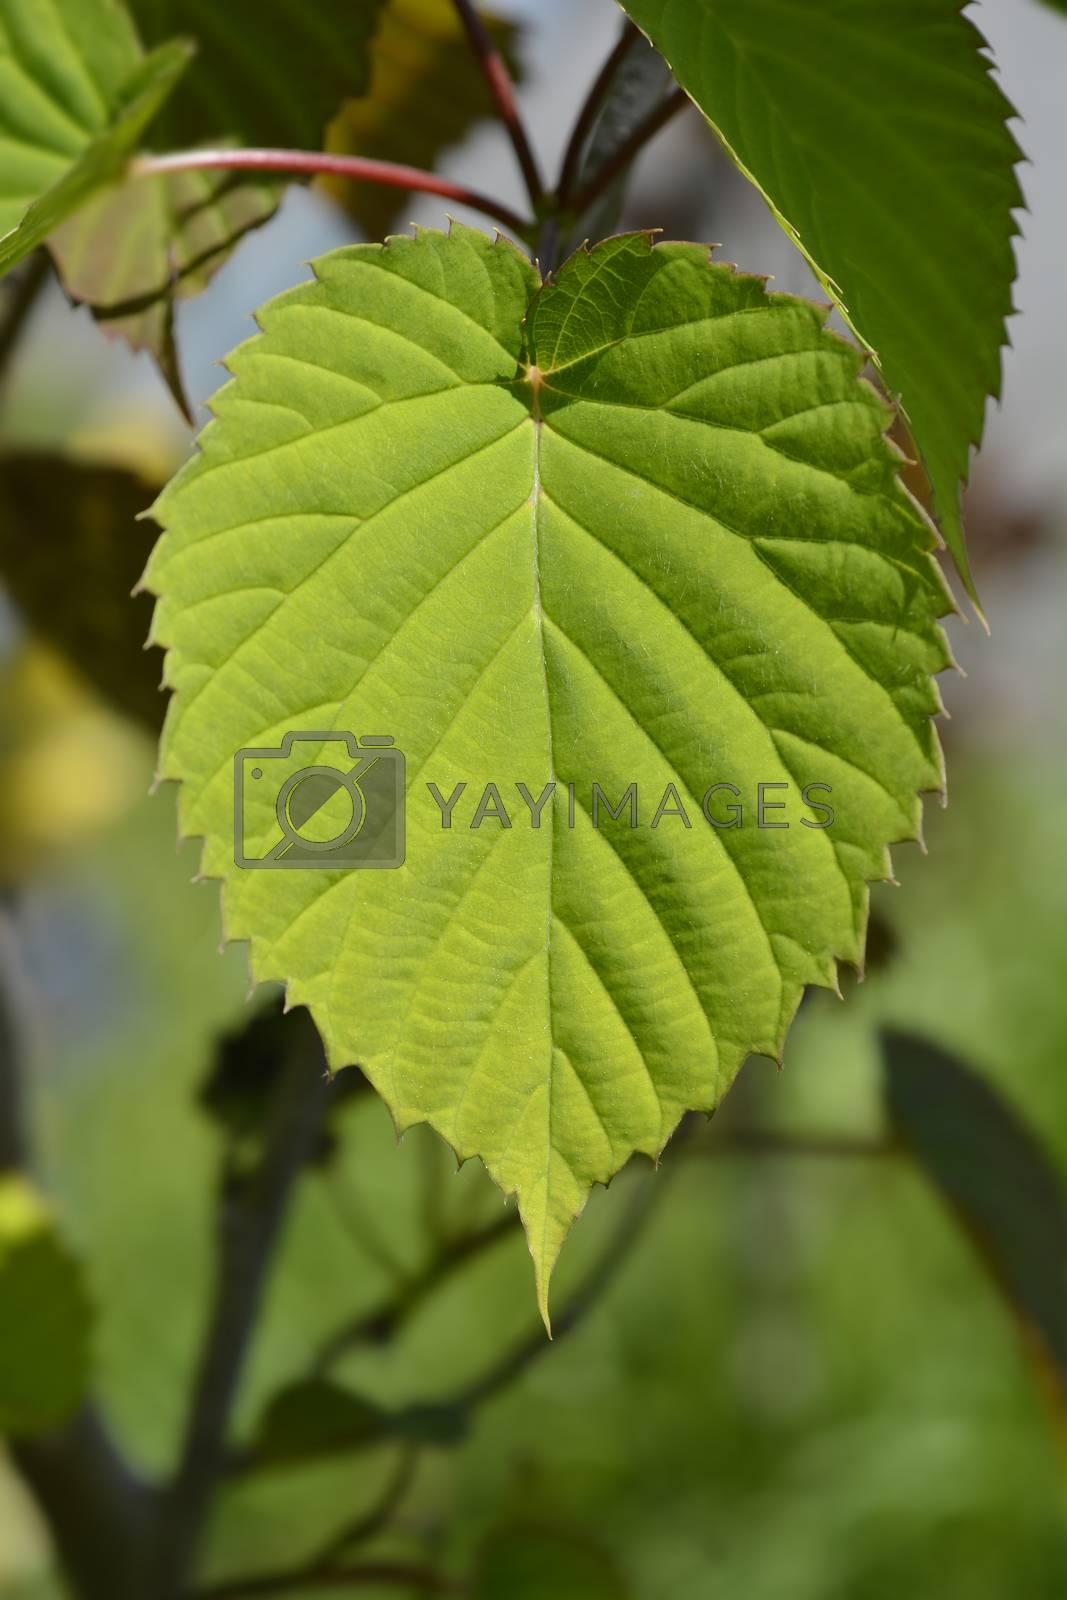 Handkerchief tree leaves - Latin name - Davidia involucrata